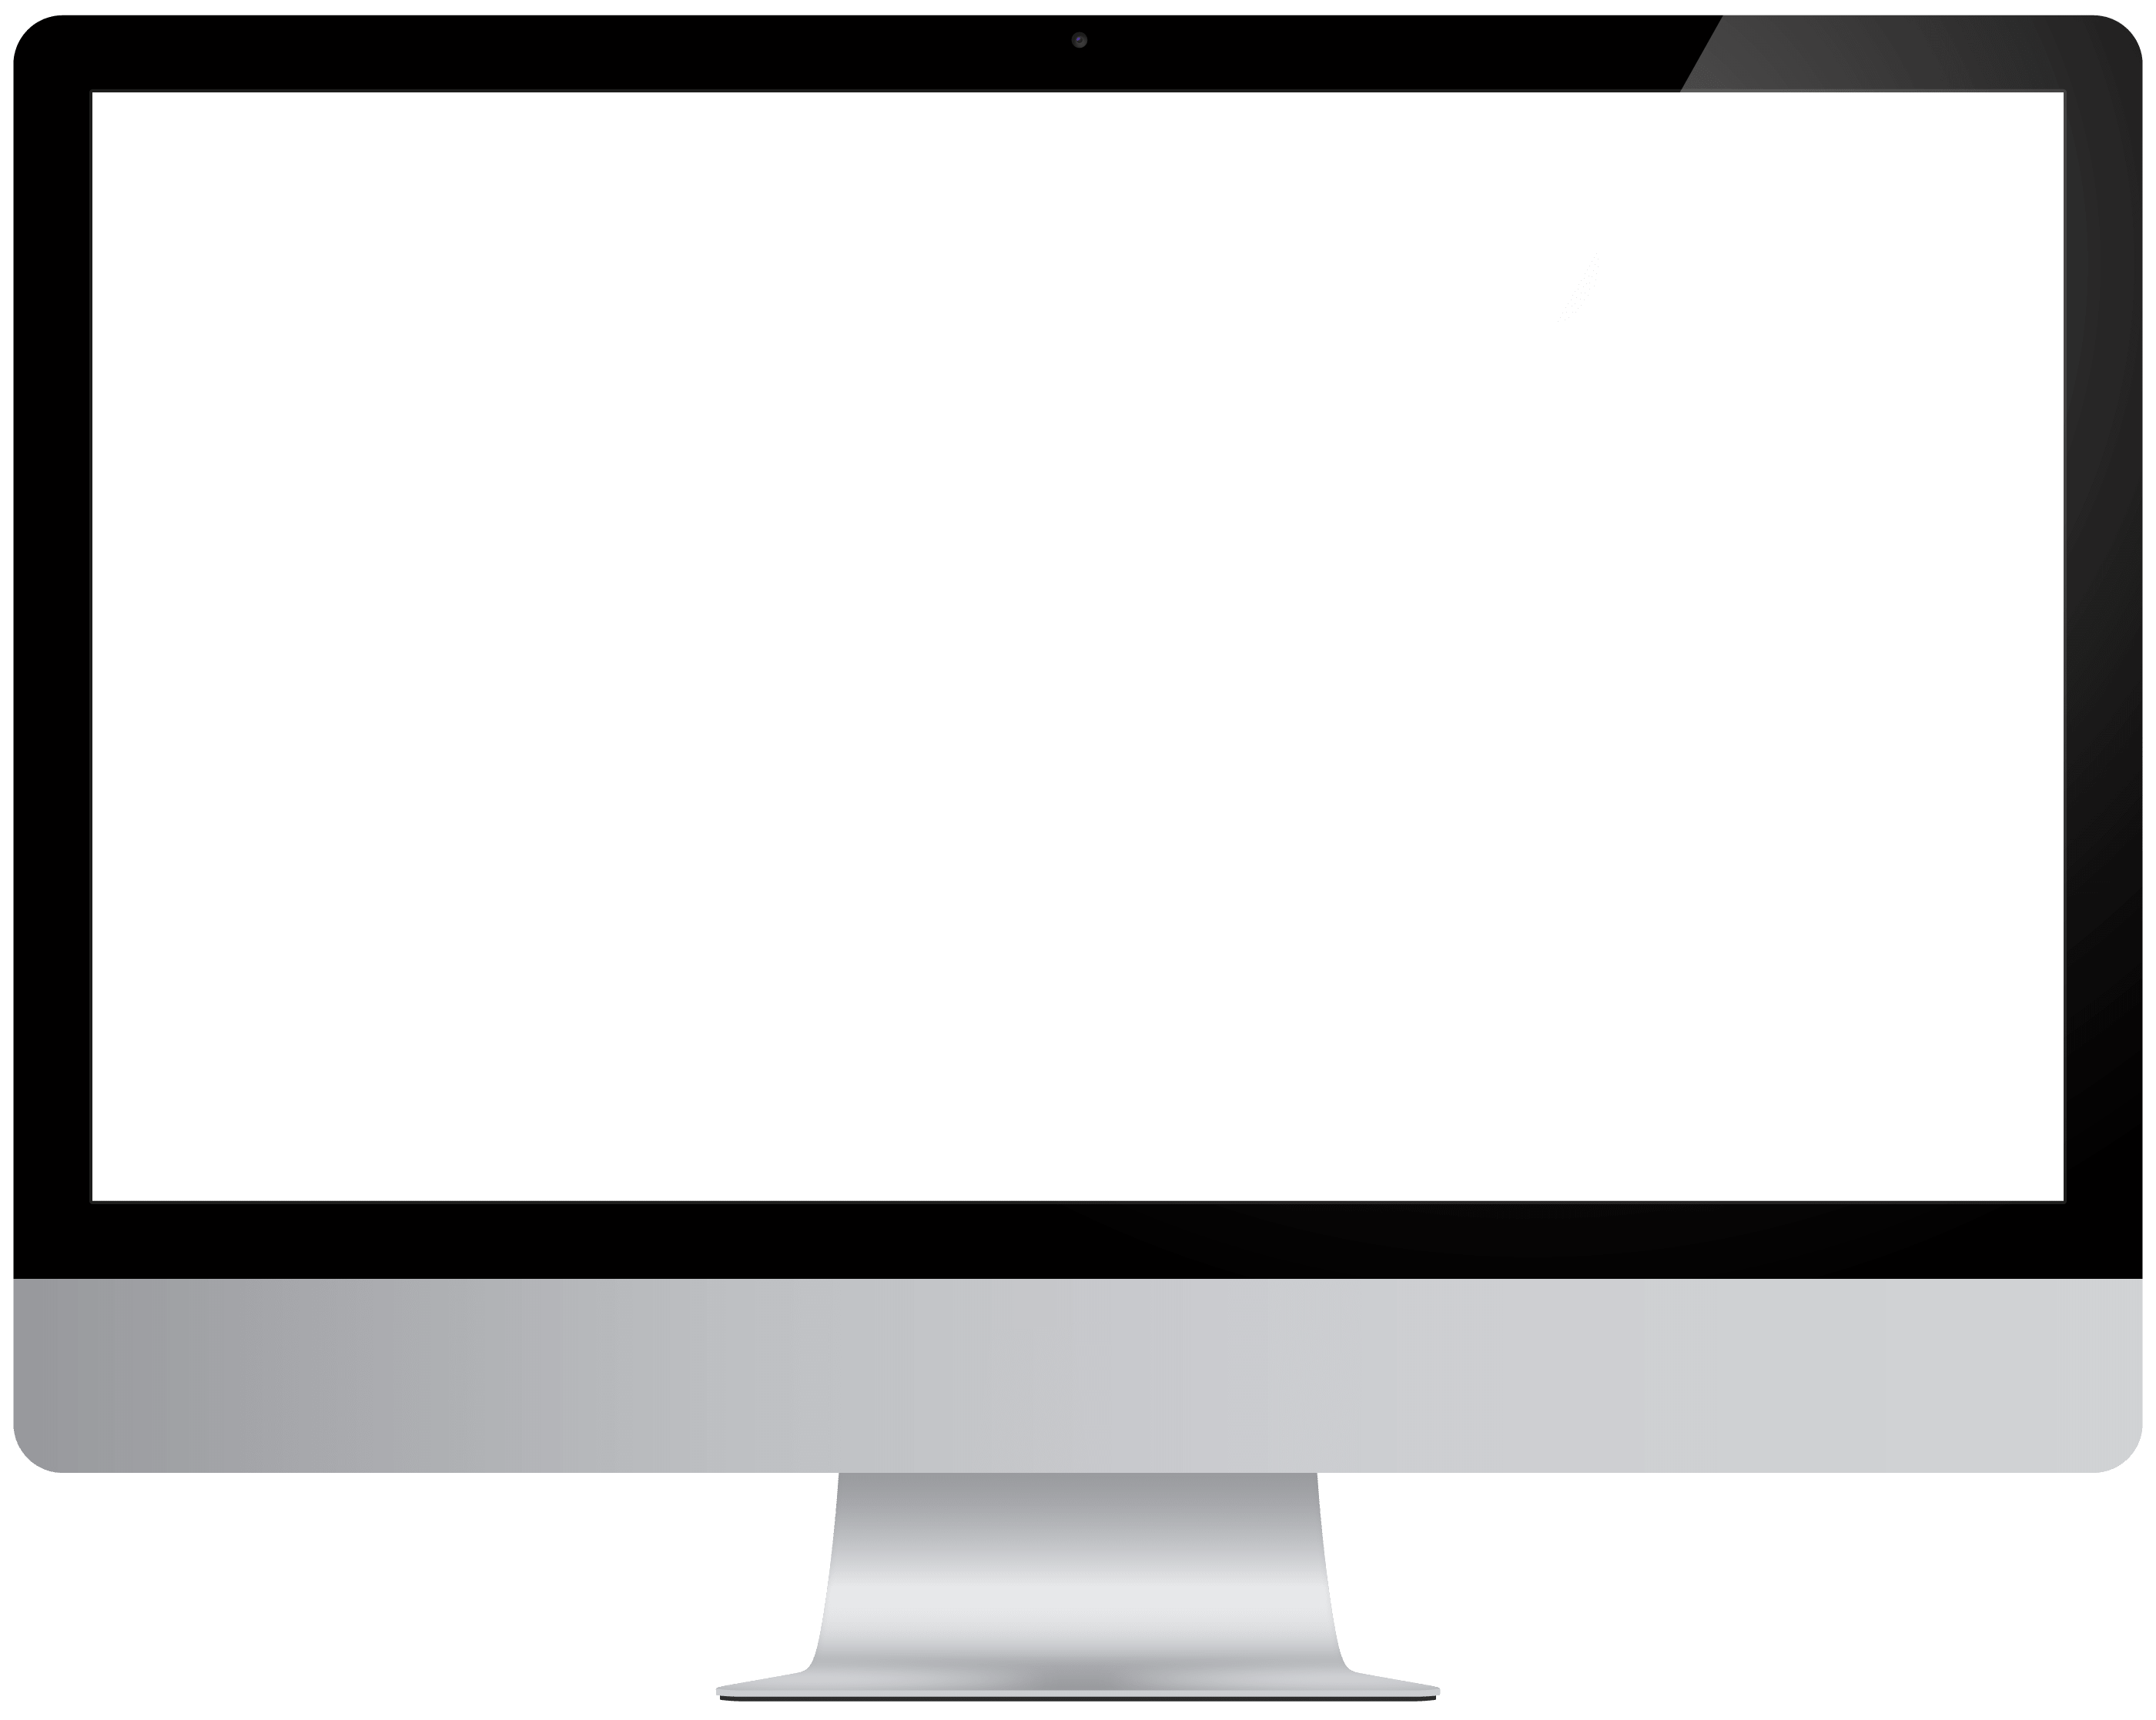 Clipart tv border. Device info live